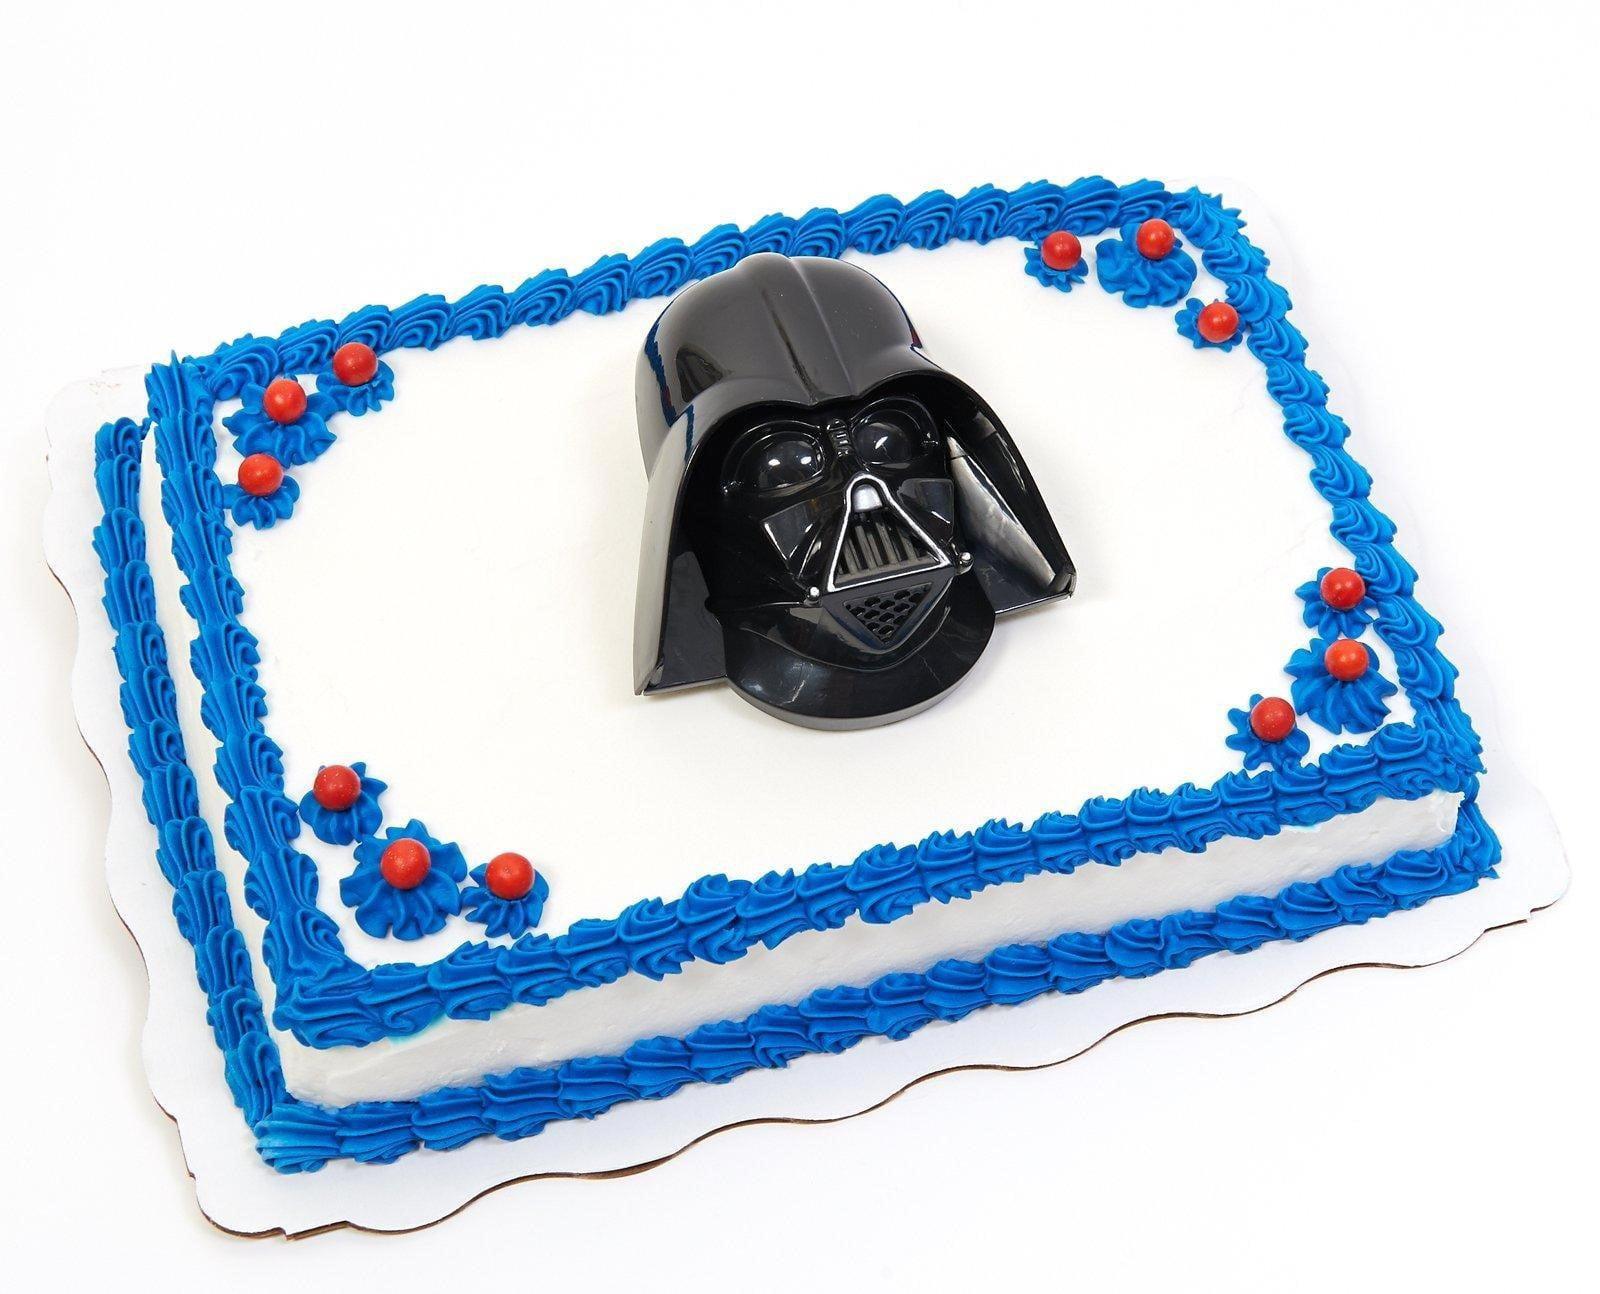 Star Wars Darth Vader Cake Topper Walmart